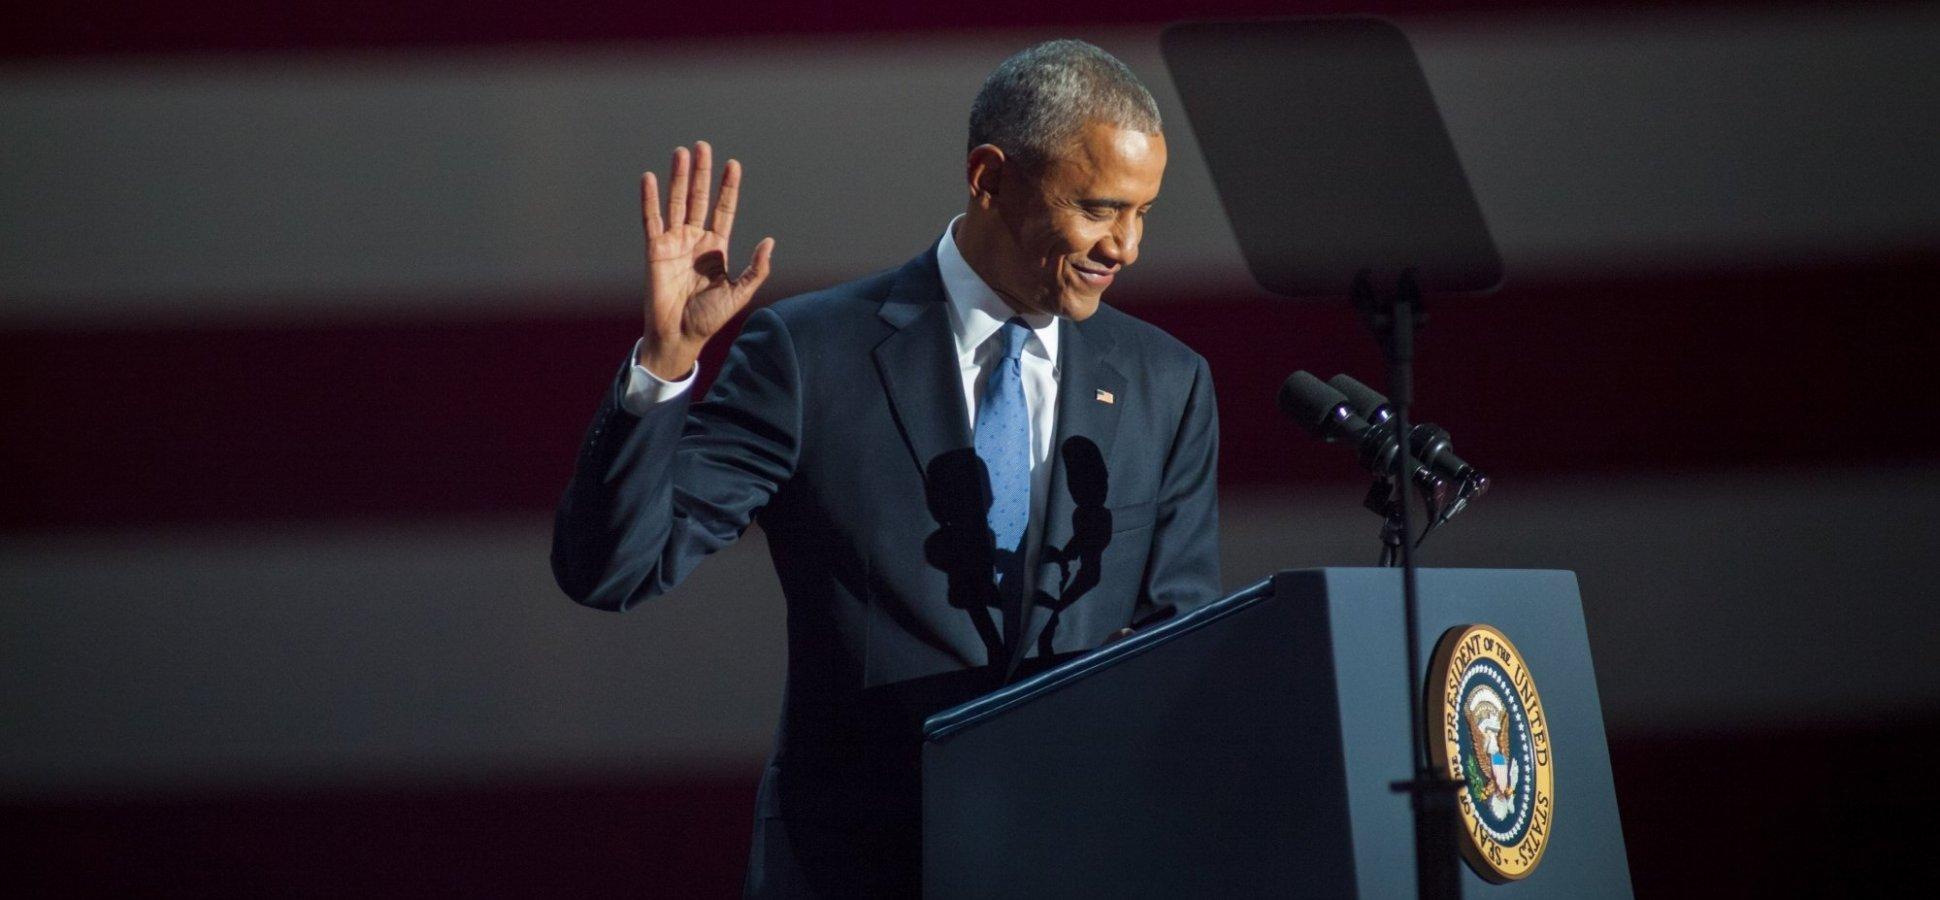 Barack Obama's Former Speechwriter Has 3 Important Tips for Making Your Next Talk Memorable